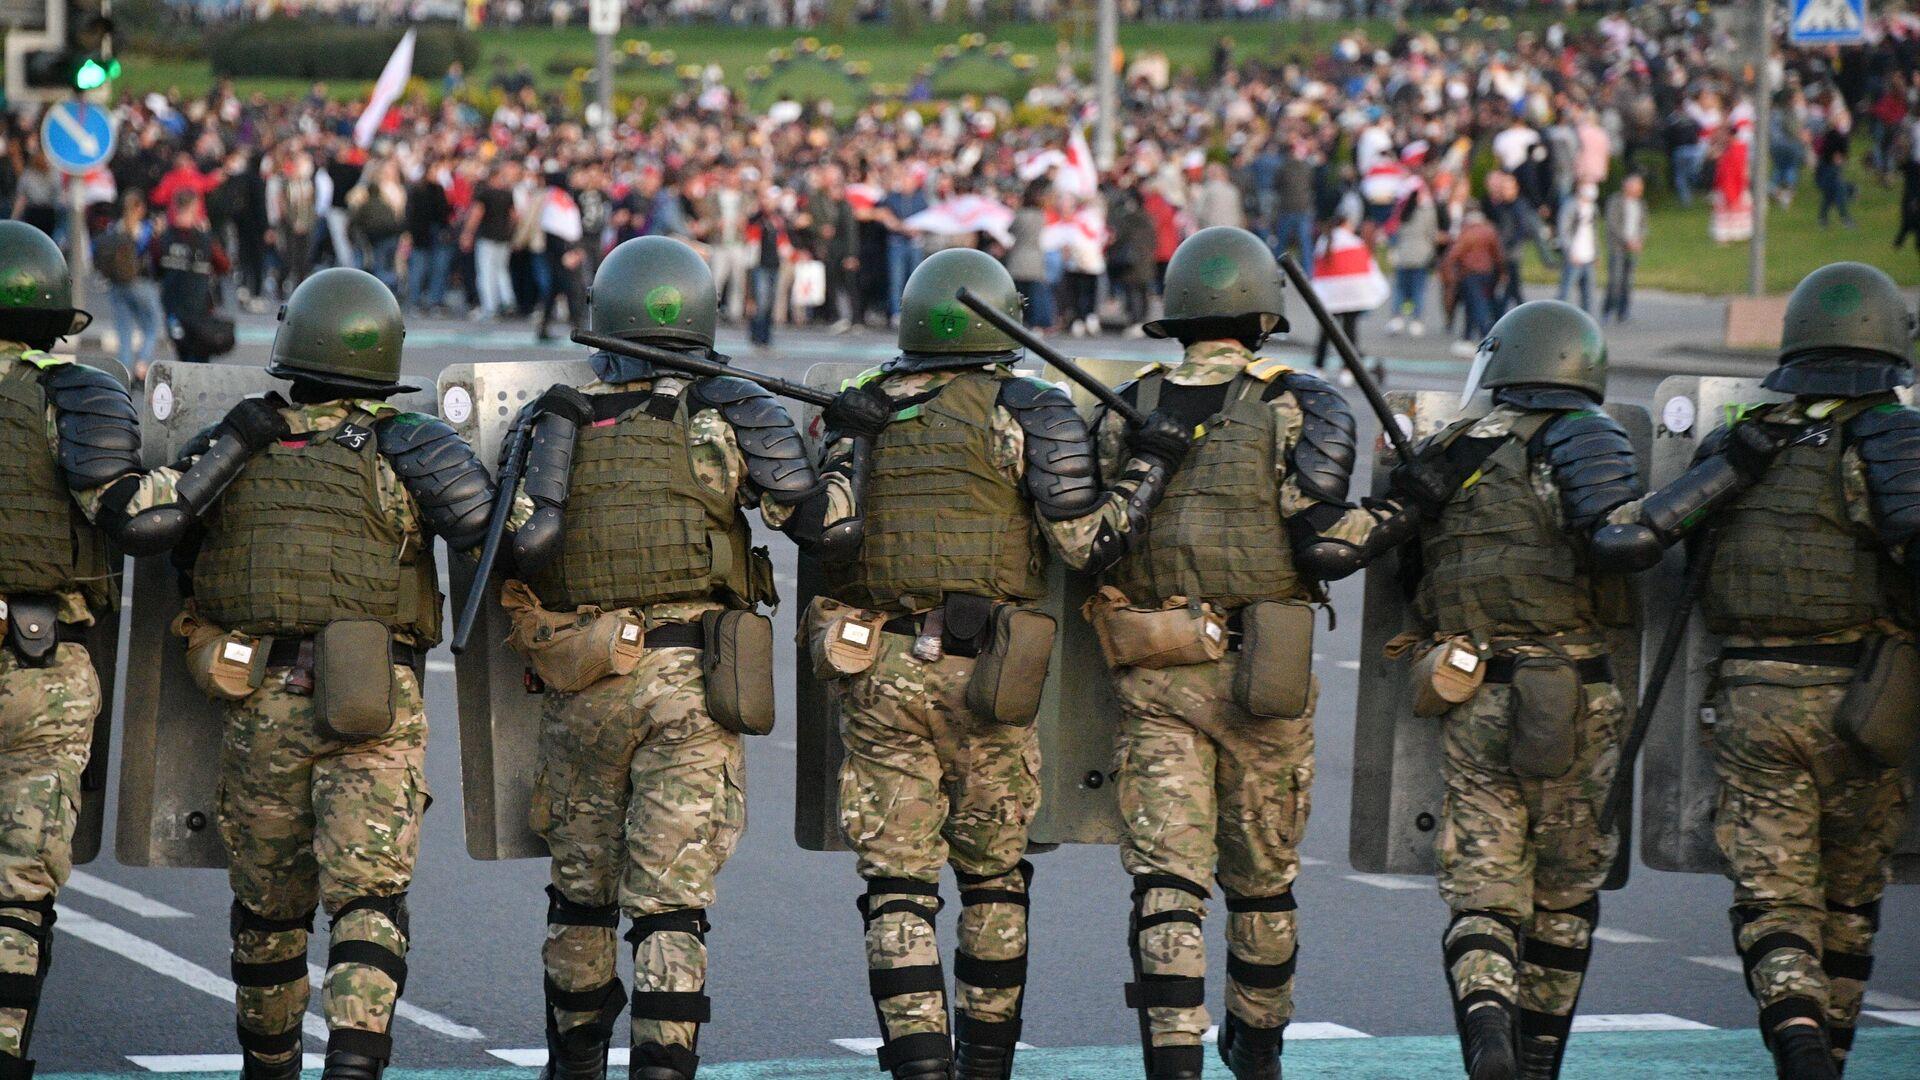 Сотрудники милиции и участники акции протеста в Минске - РИА Новости, 1920, 27.09.2020